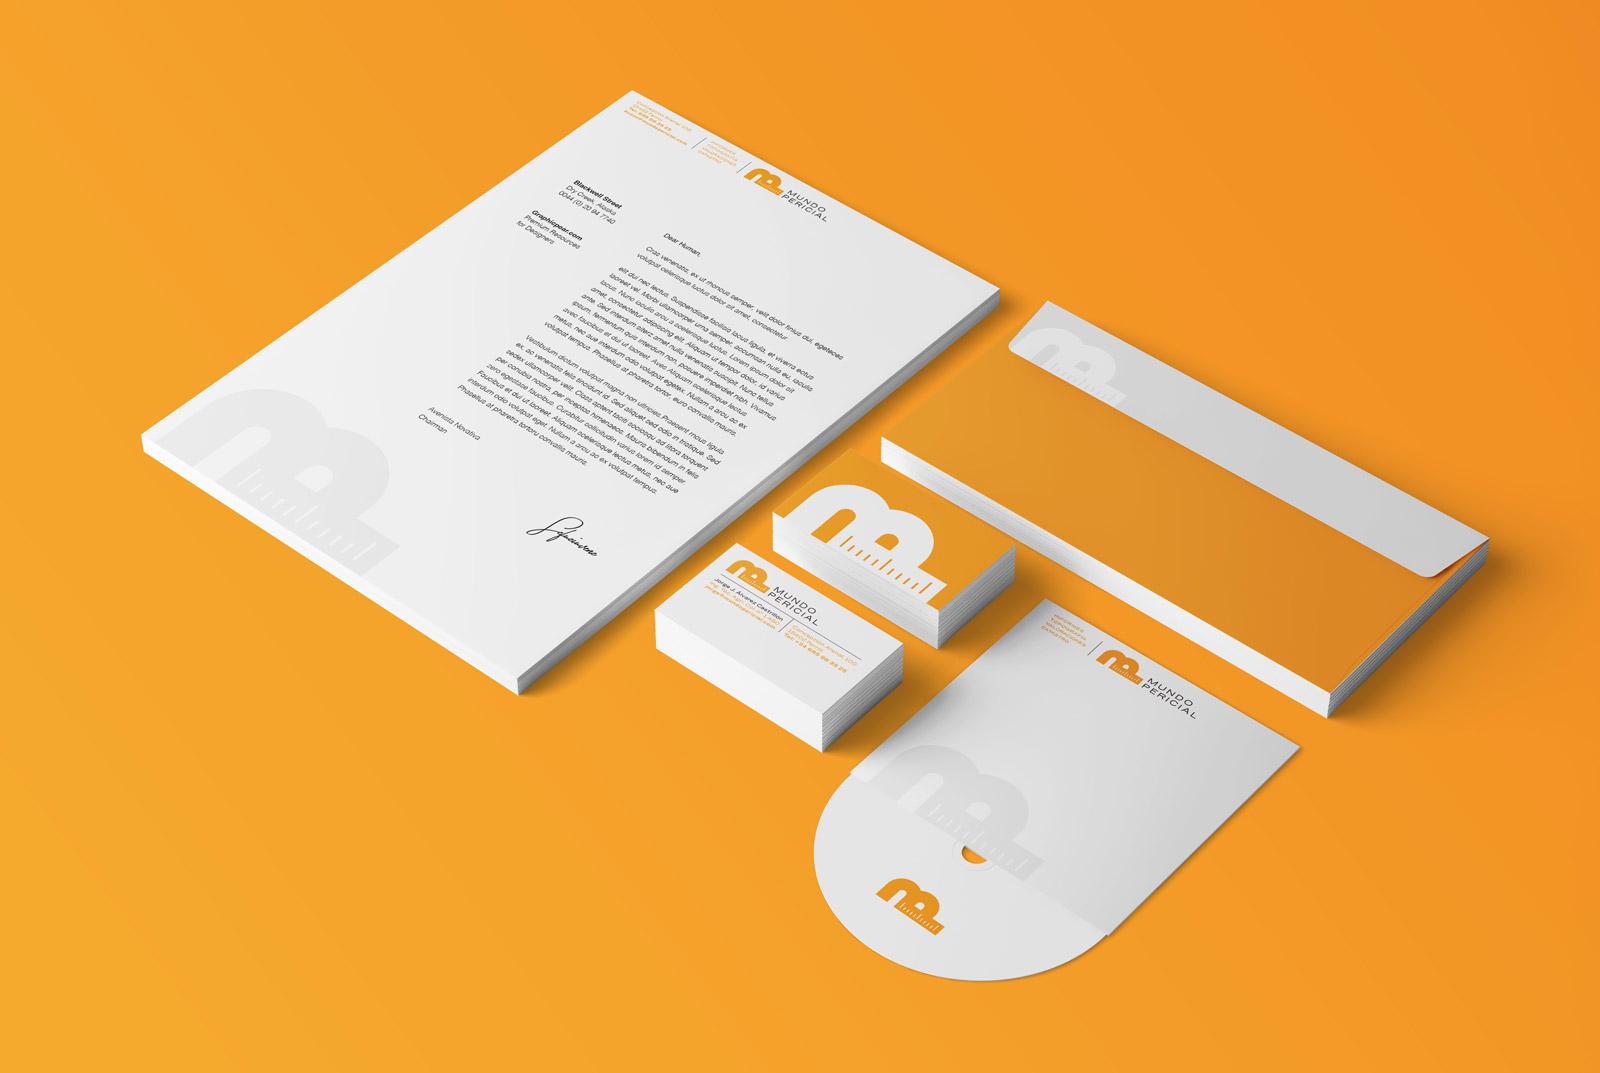 Mundo-Pericial-Branding-03